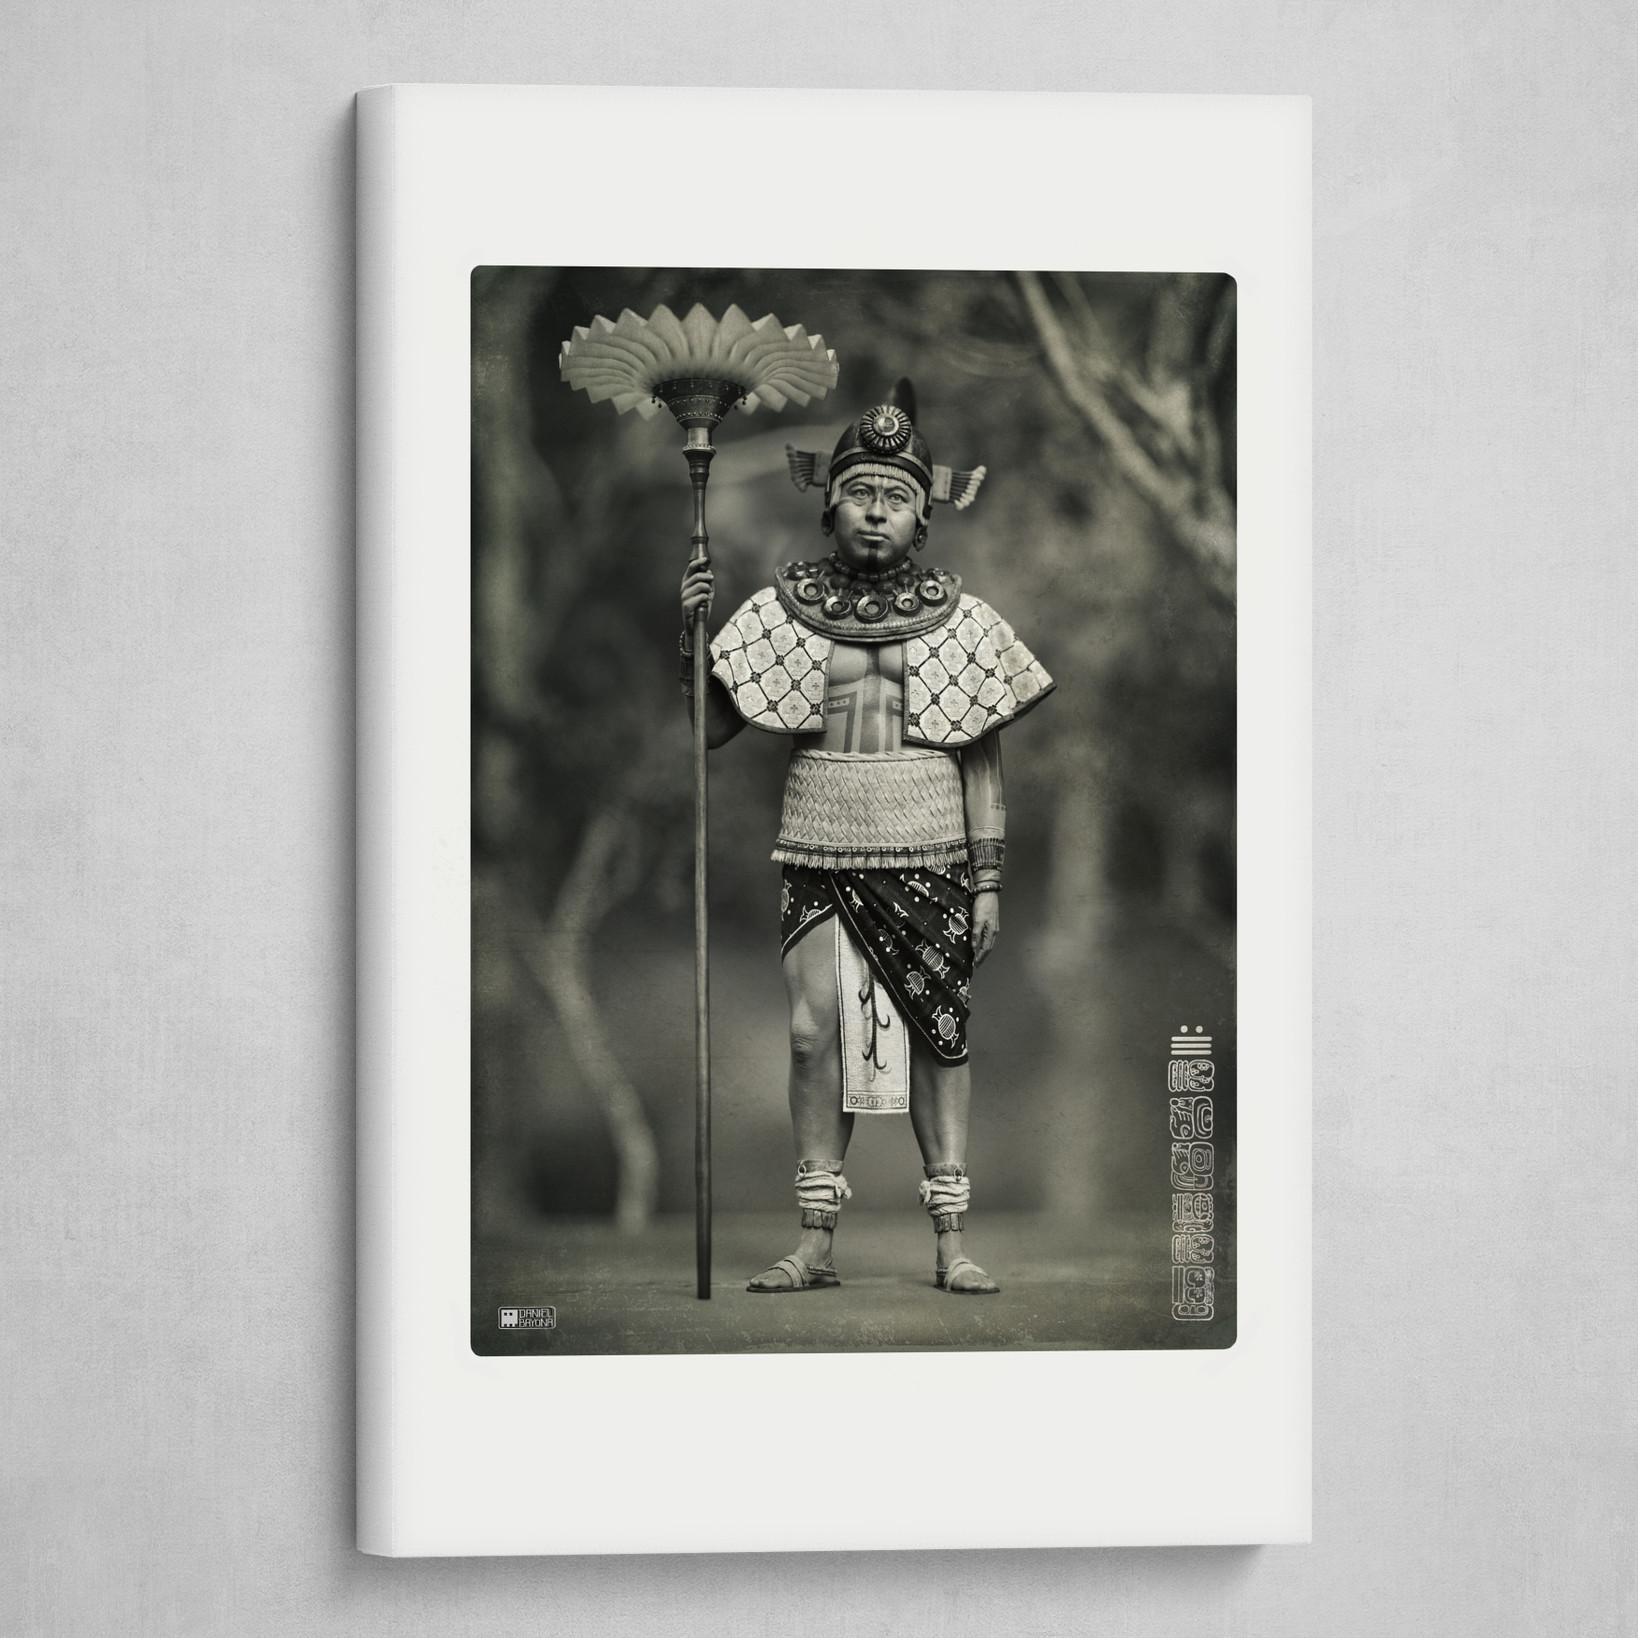 Maya Merchant 10th Century / B&W